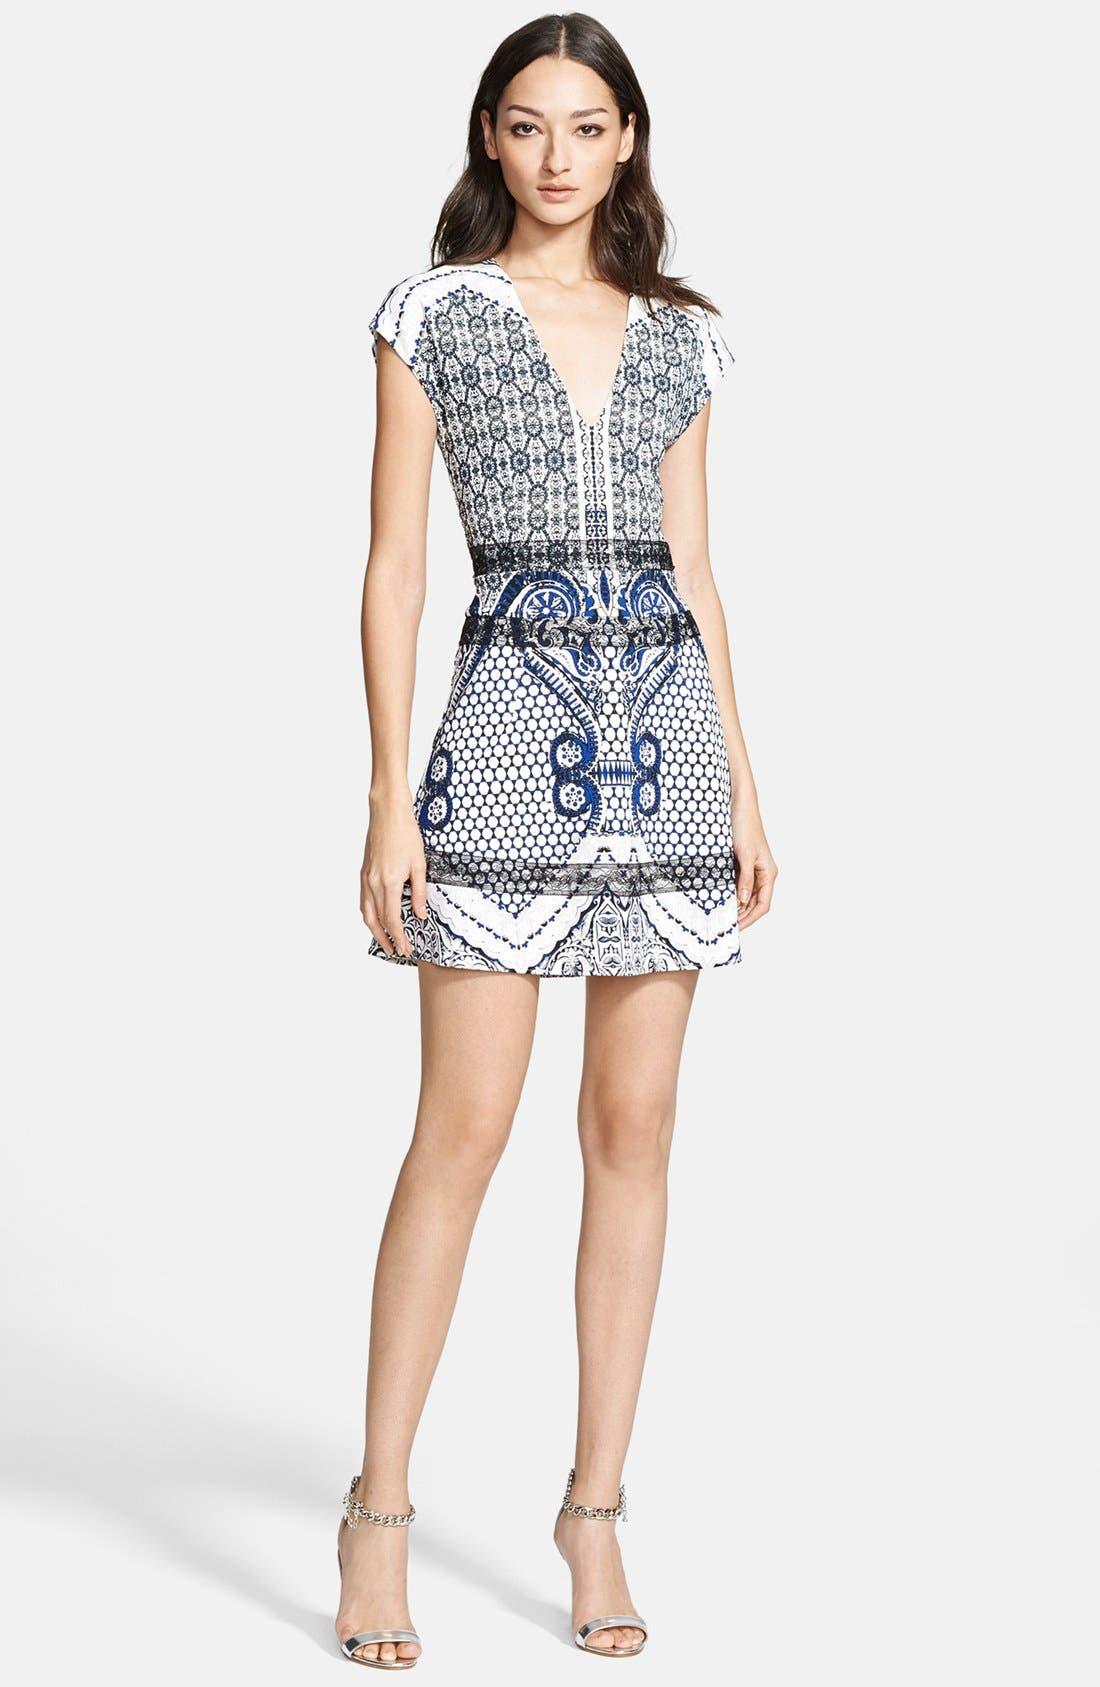 ROBERTO CAVALLI, Print Fit & Flare Dress, Main thumbnail 1, color, 400